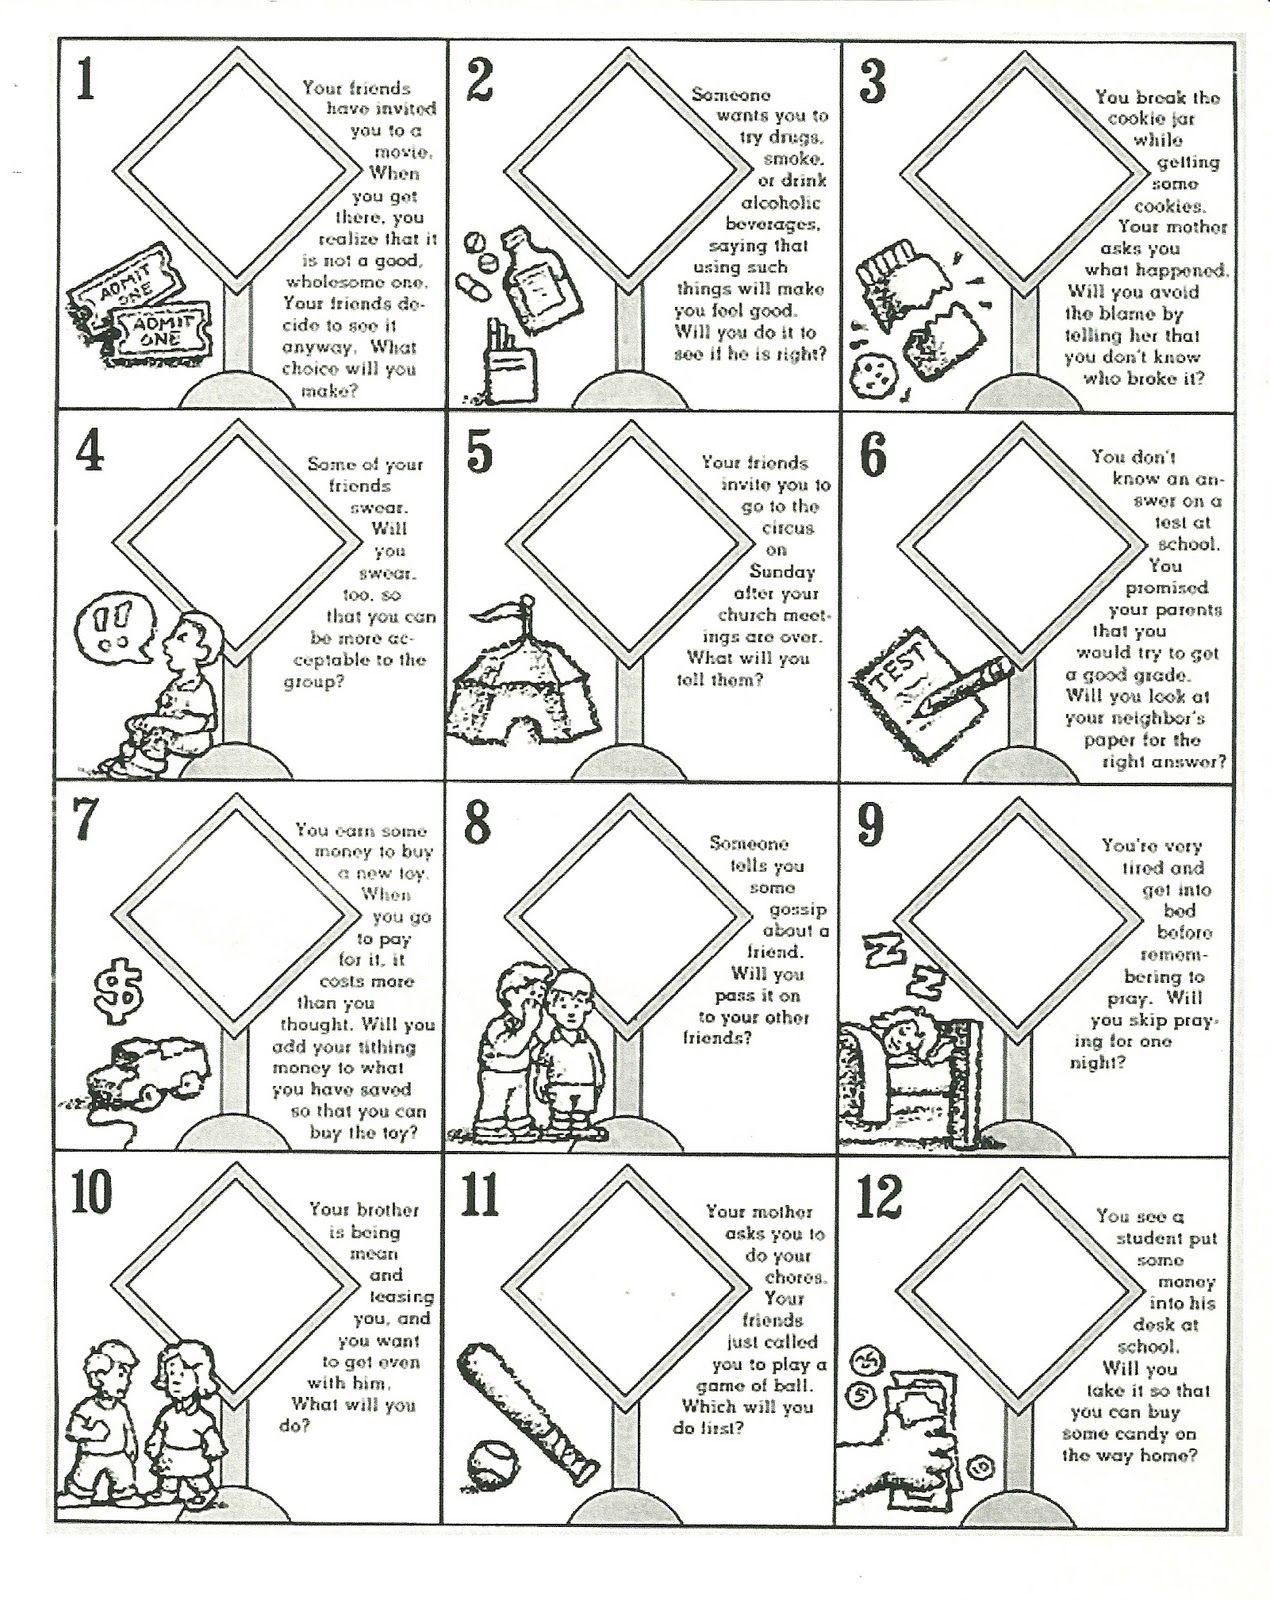 Primary 2 Manual Lesson 14 Dare To Choose The Right